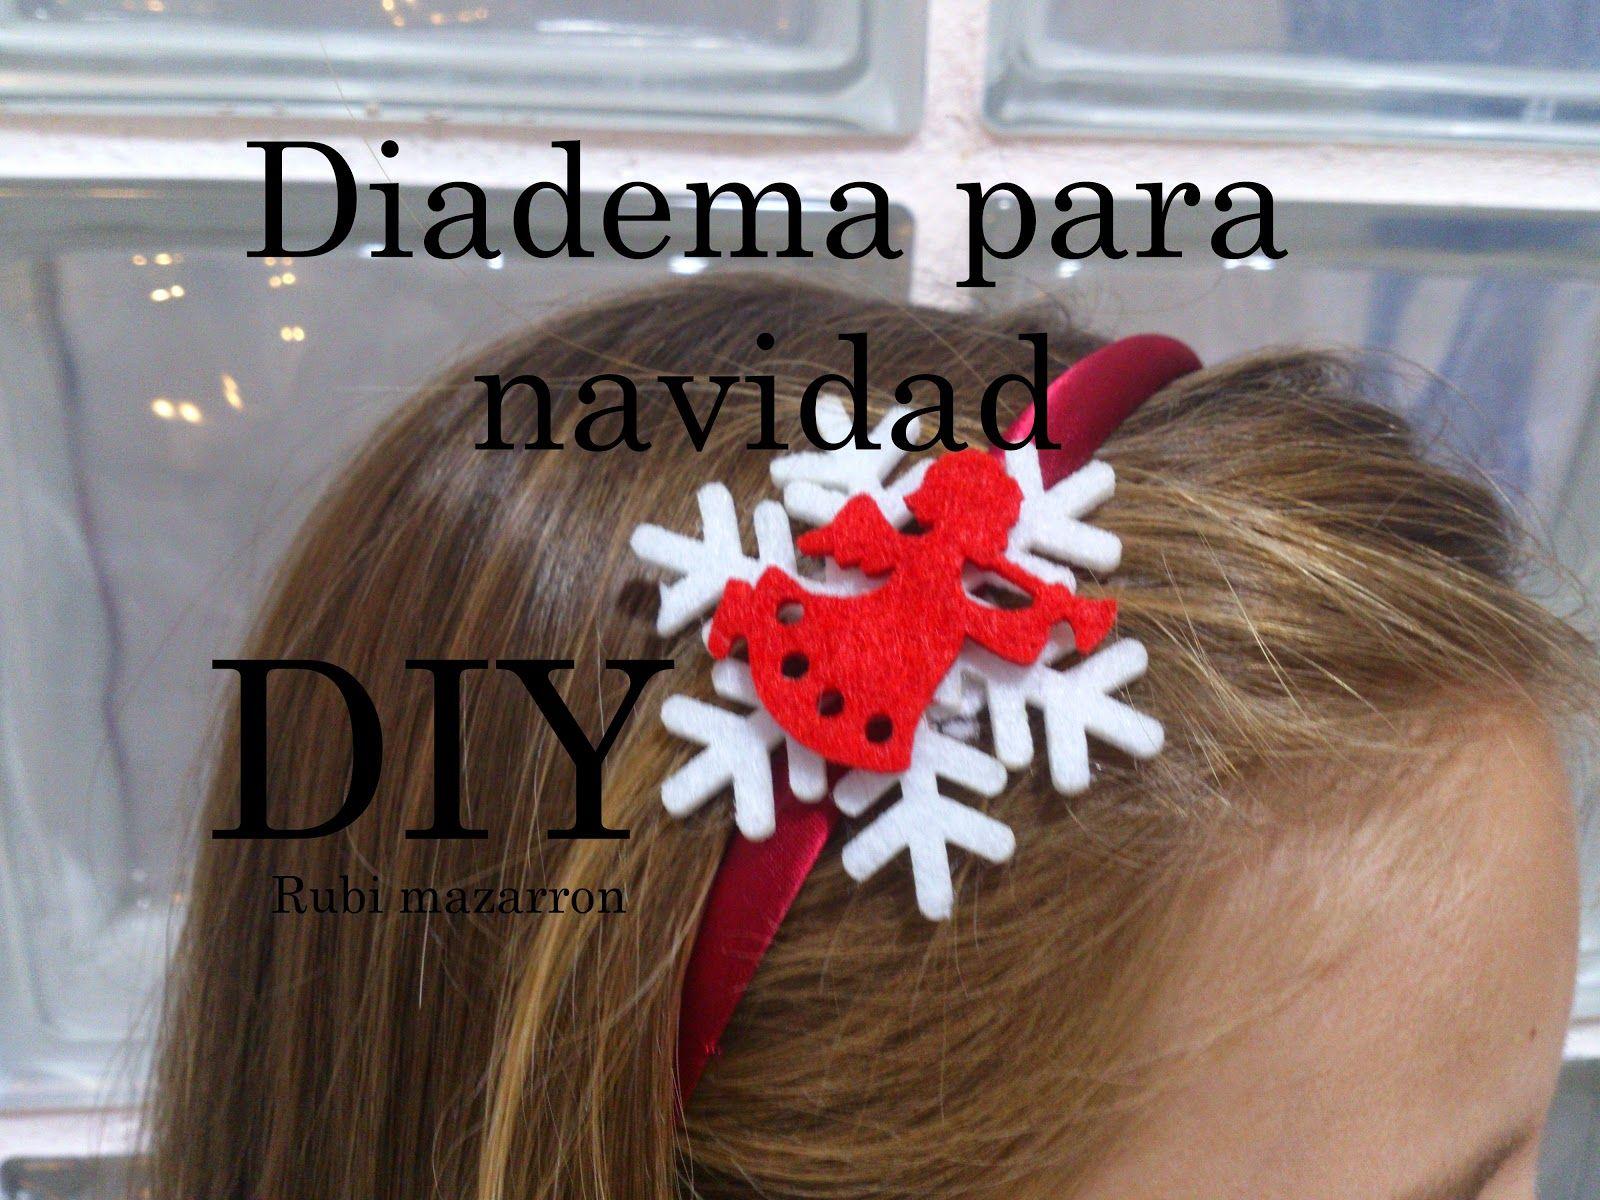 rubi. fotos de mis manualidades : Diademas para Navidad